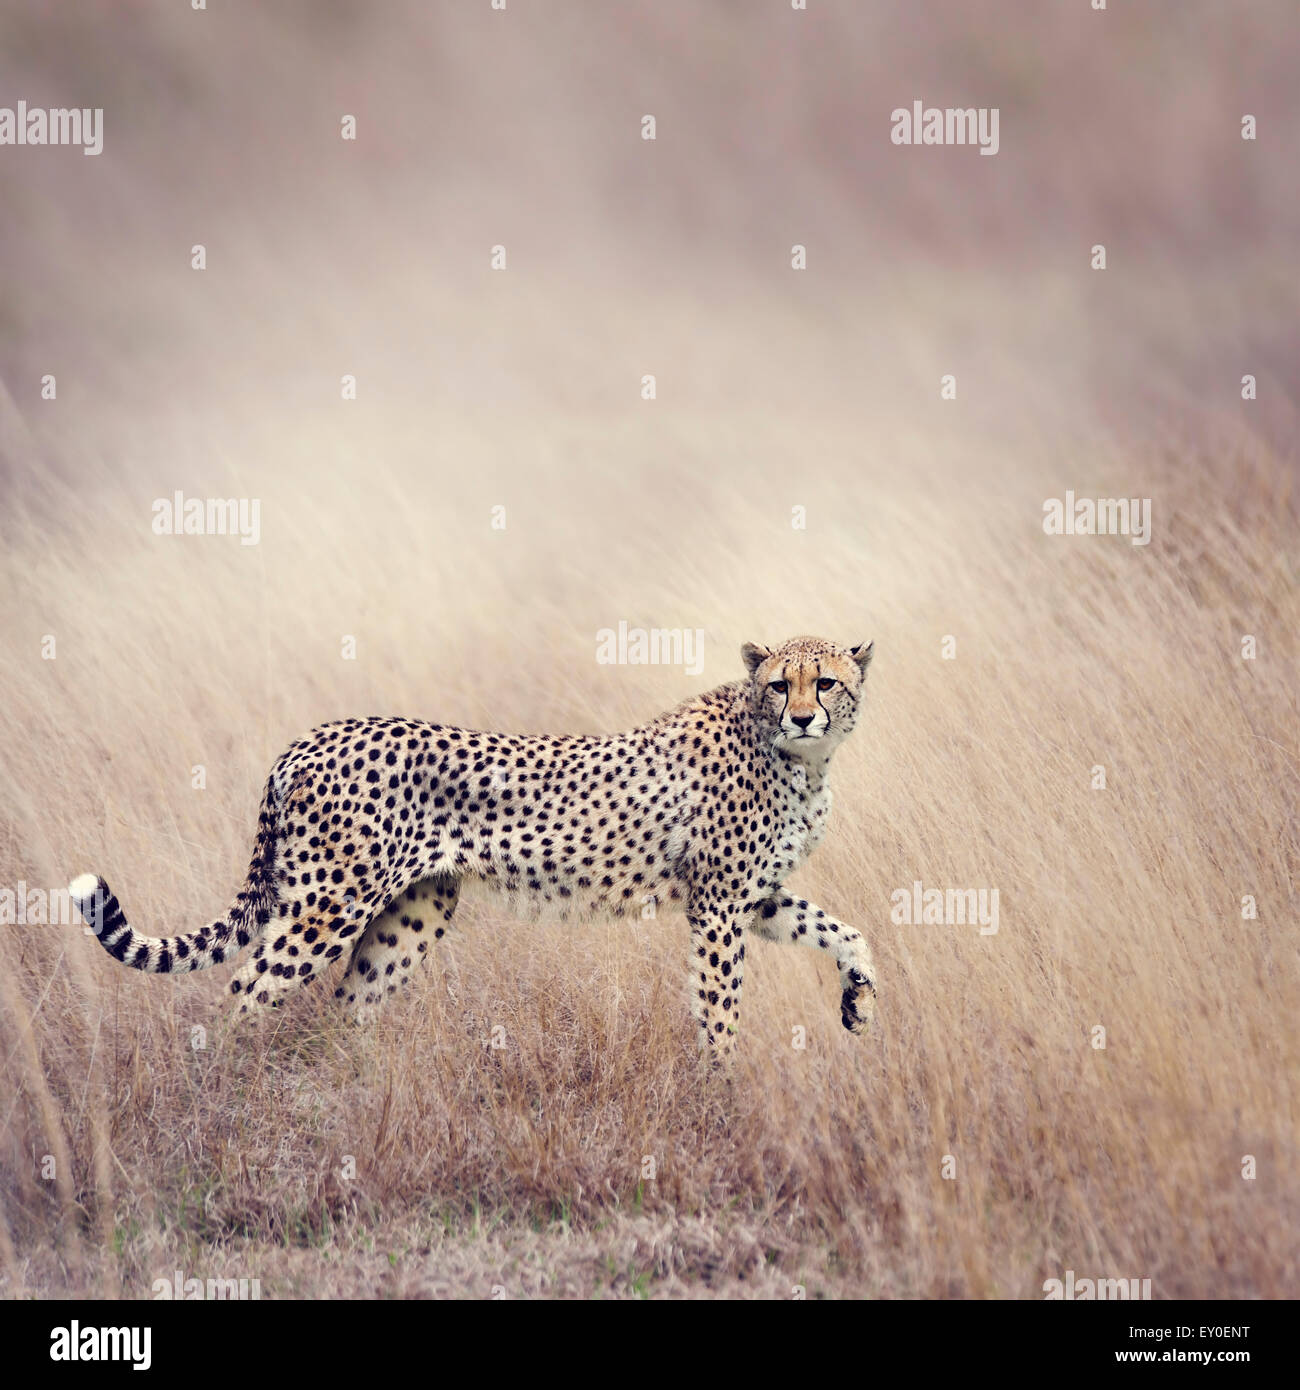 Cheetah Stalking Through The  Grassland - Stock Image